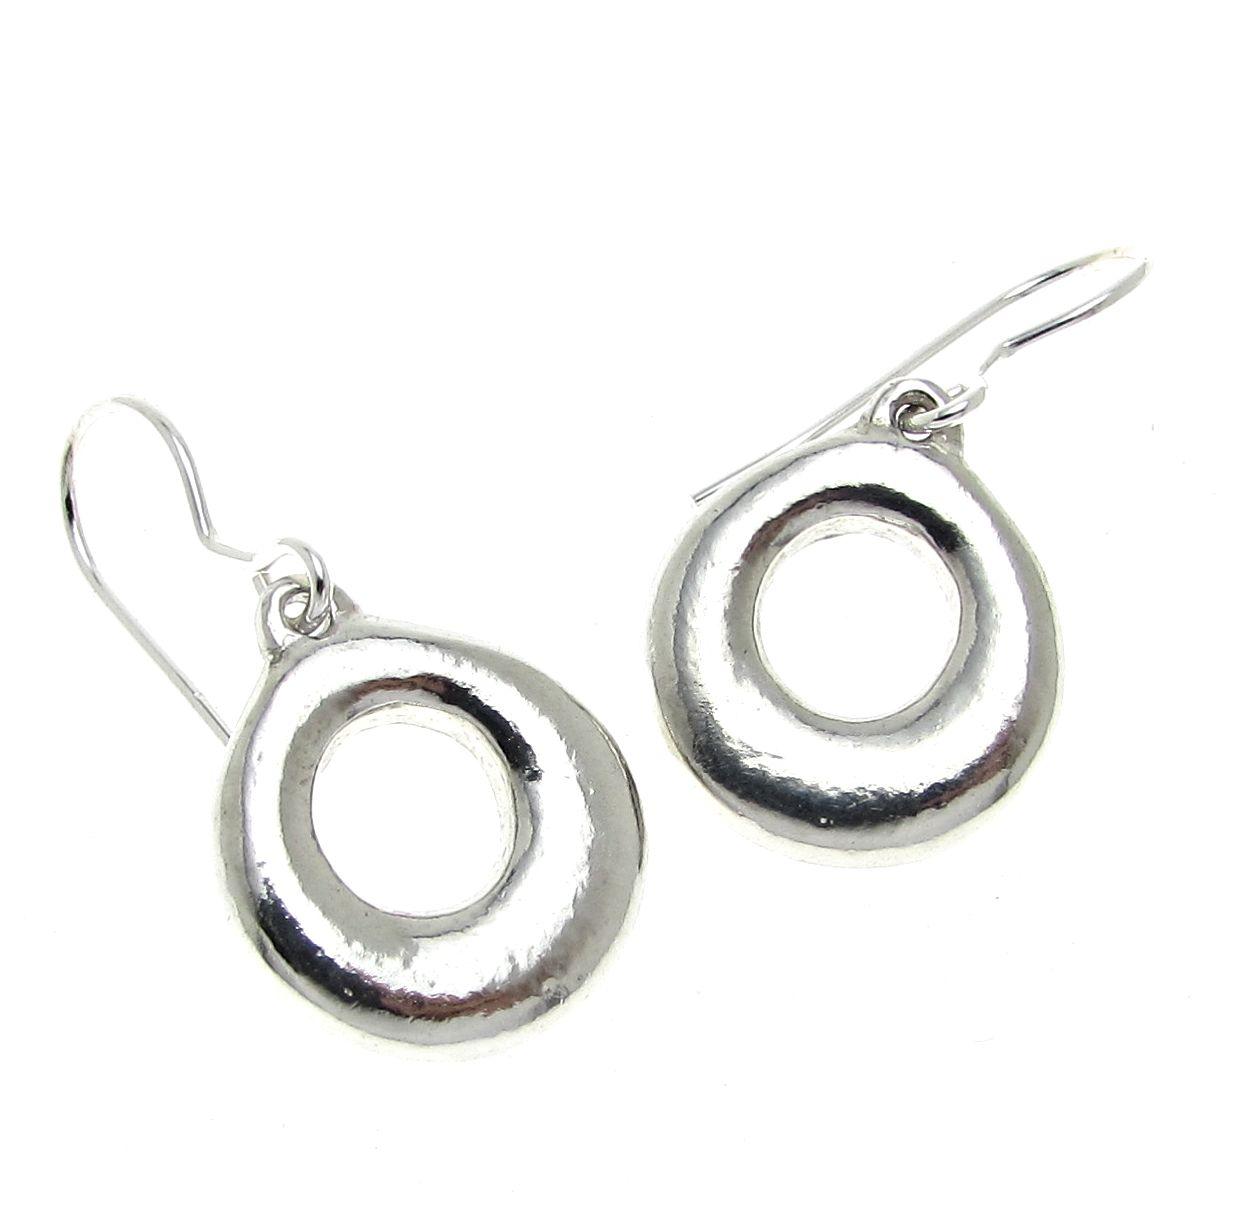 Donut earrings cast in Cornish tin